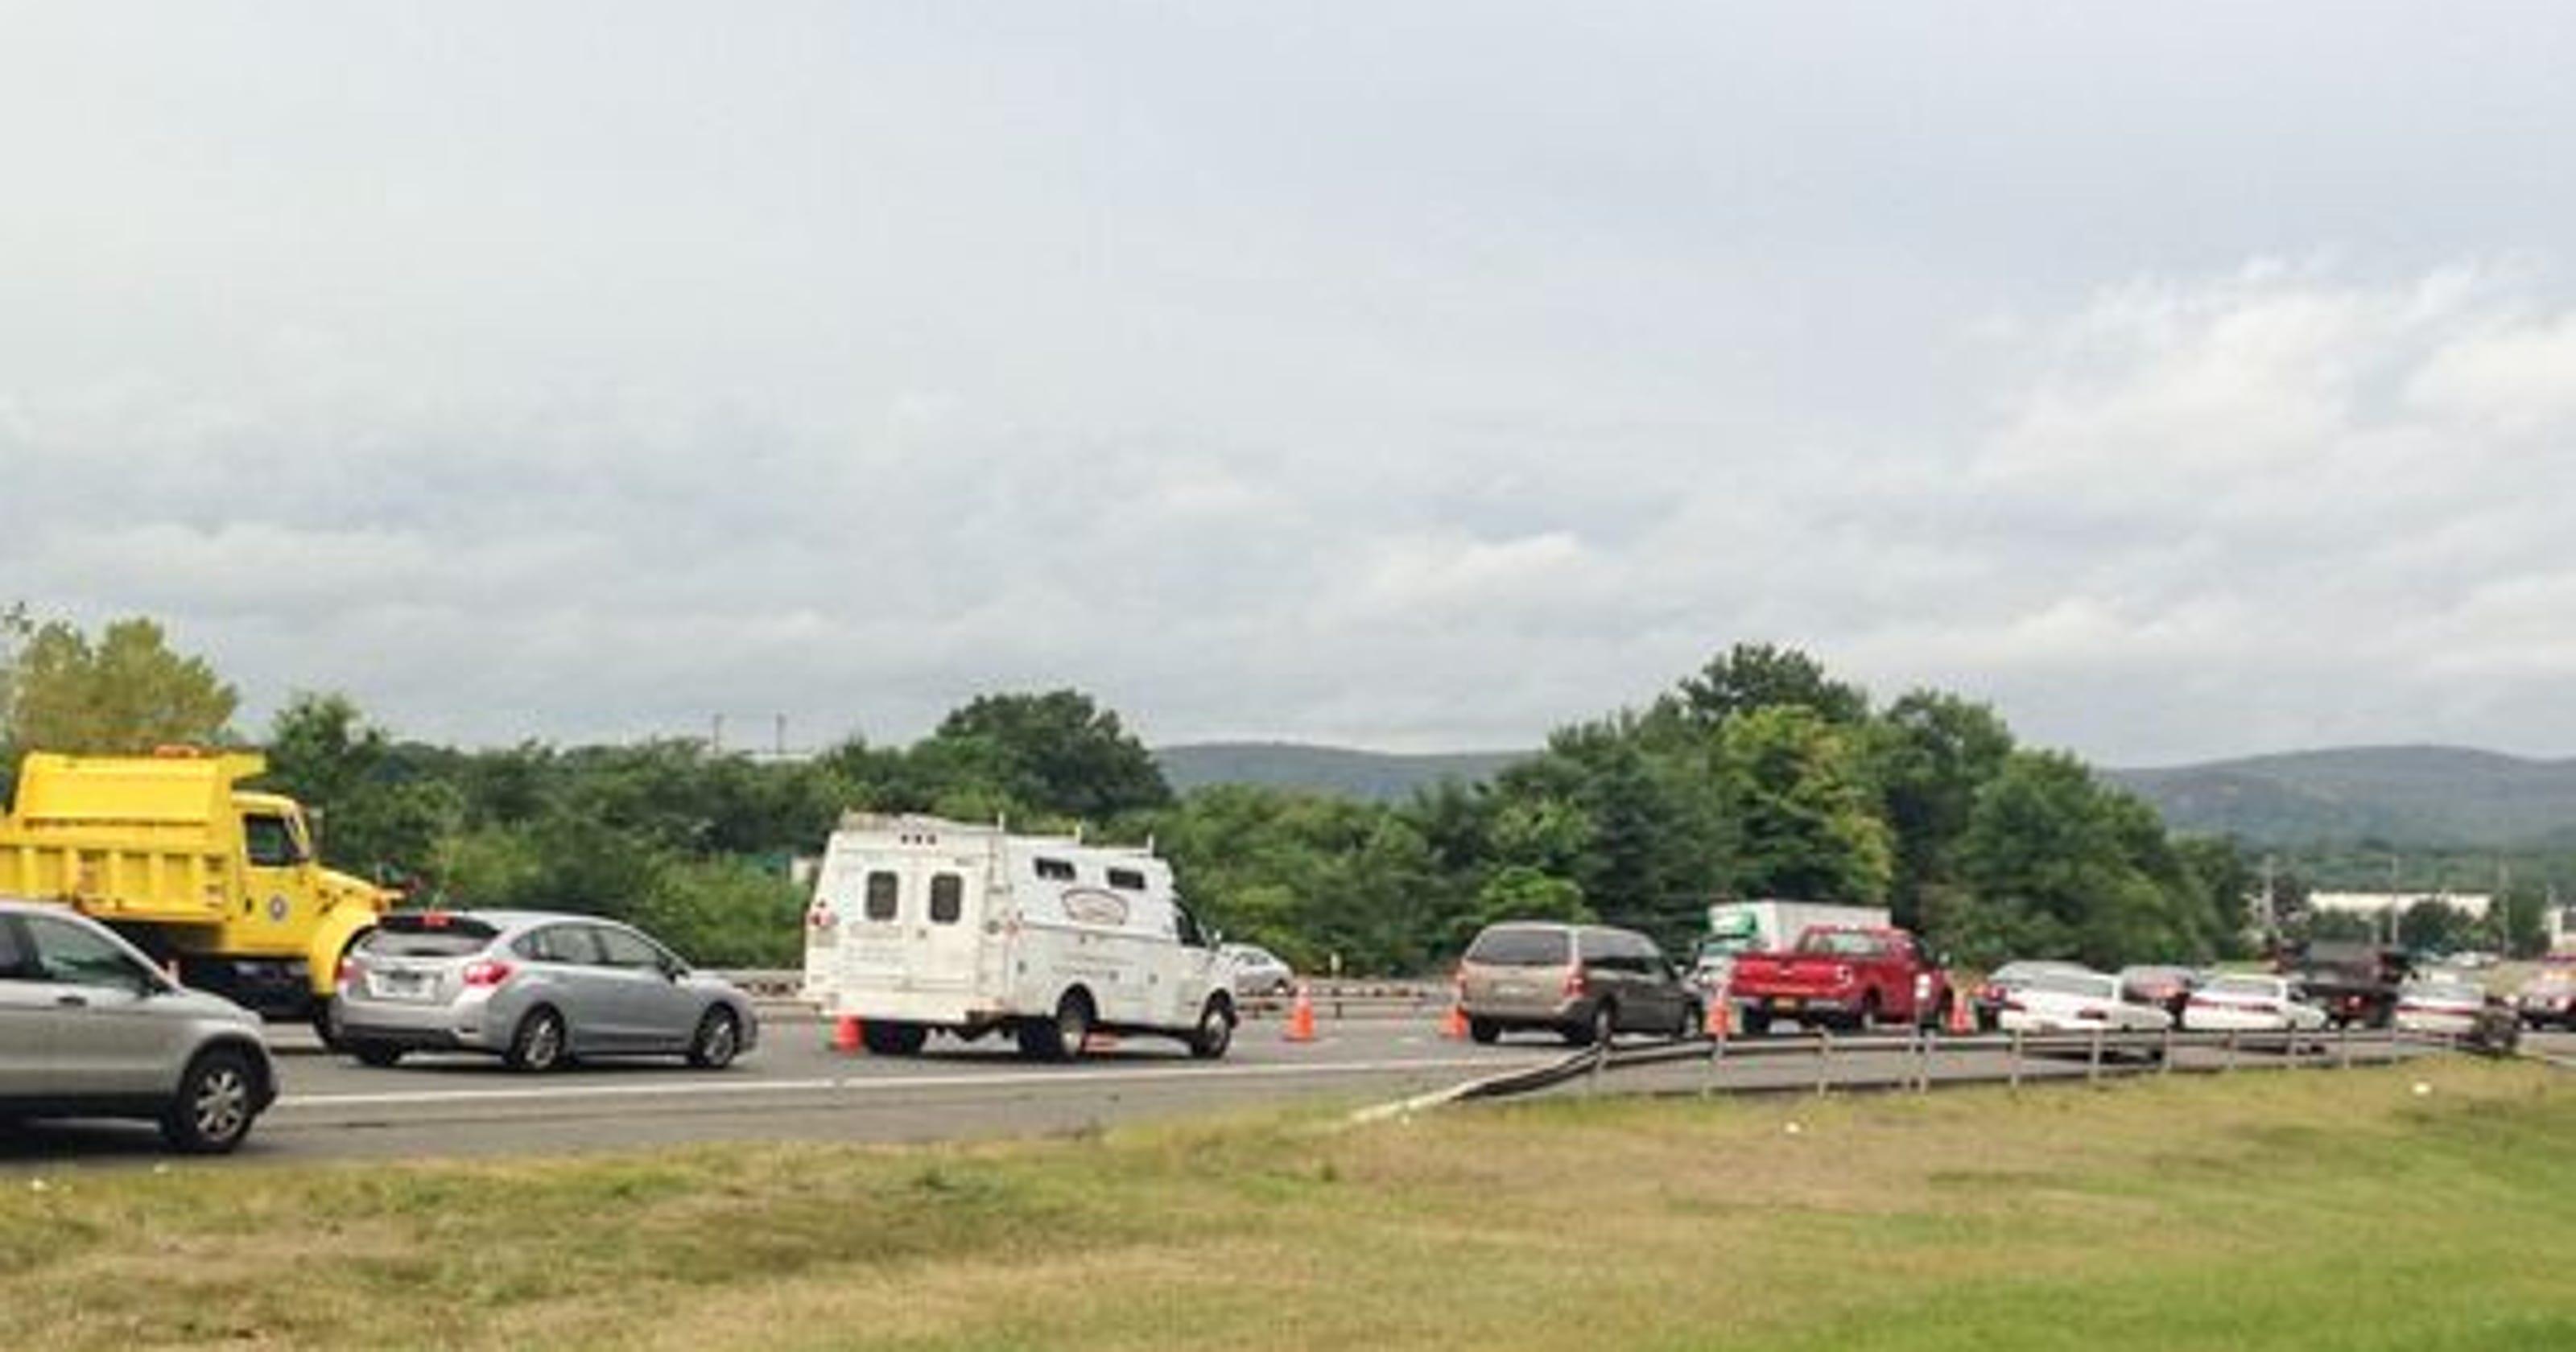 2 dead in wrong way Thruway crash in Suffern